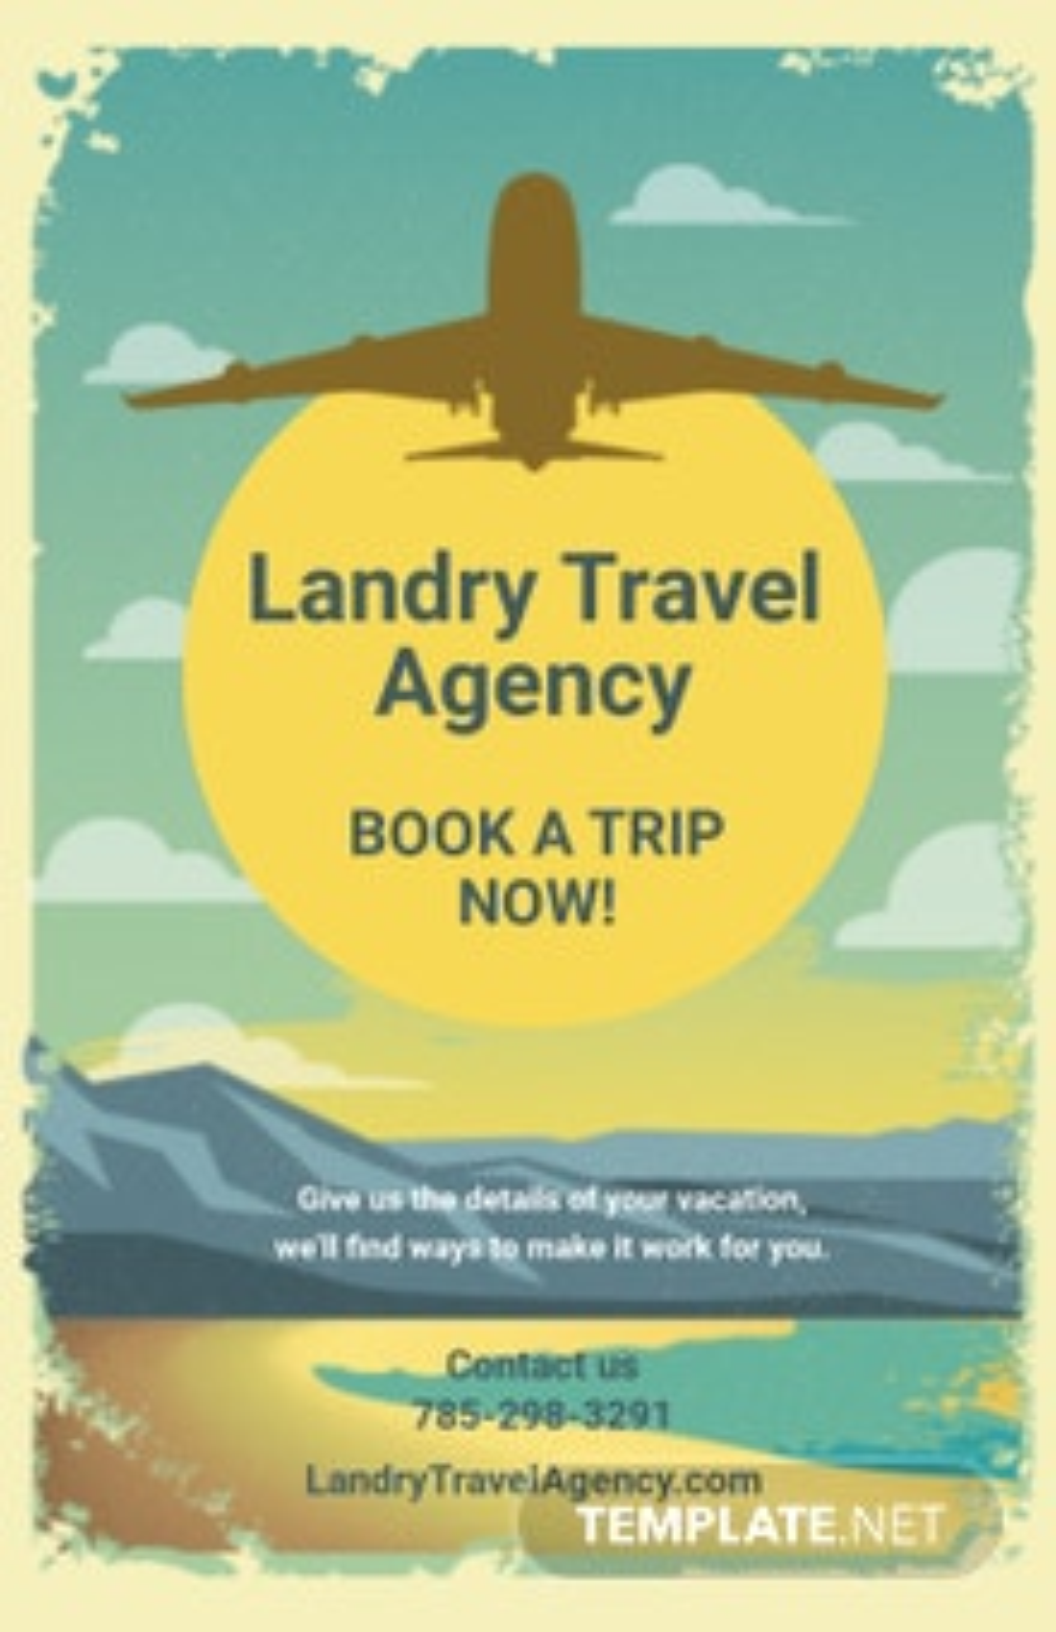 Free Retro Vintage Travel Poster Template